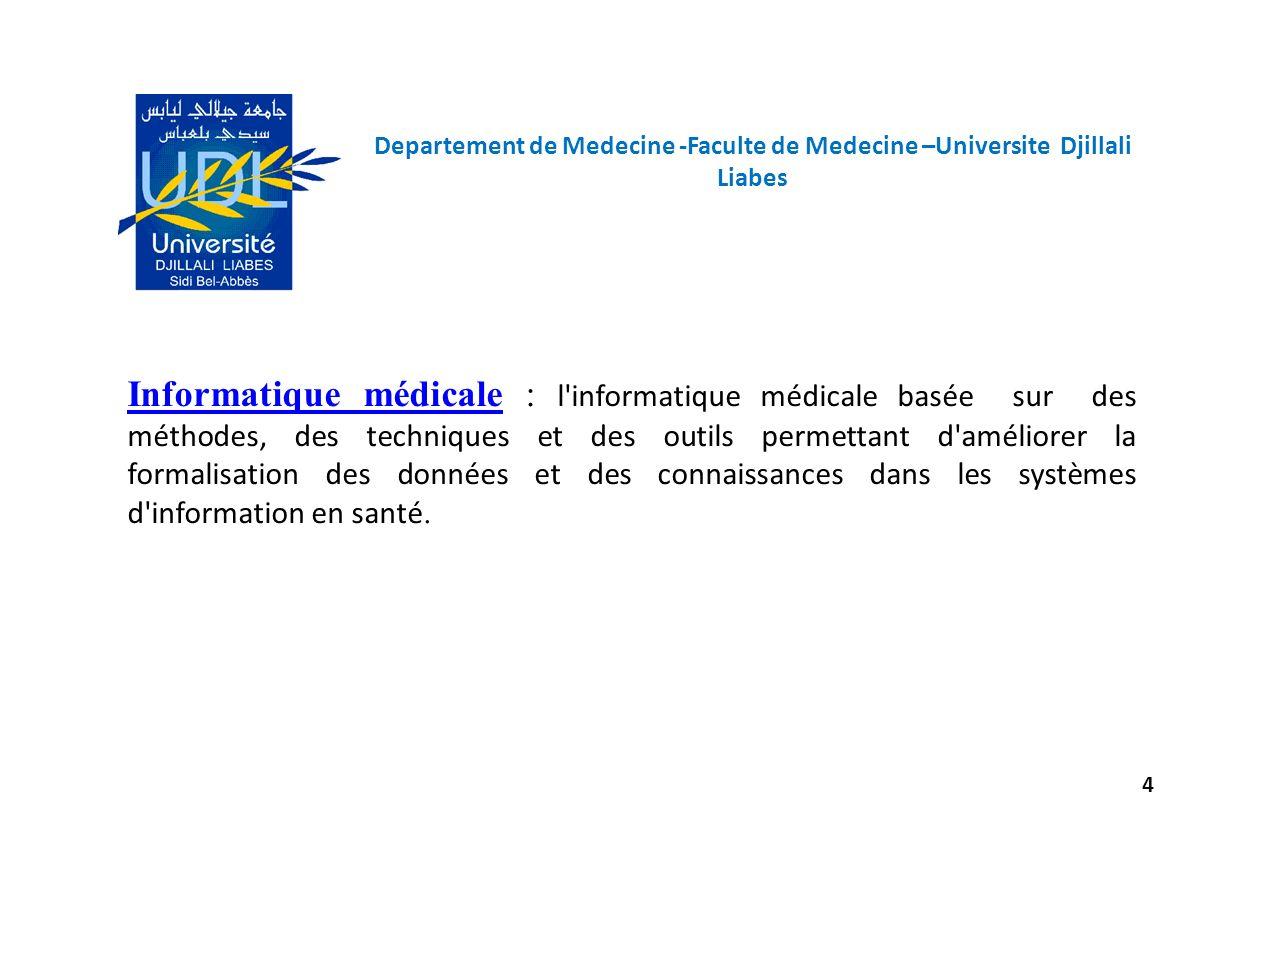 Departement de Medecine -Faculte de Medecine –Universite Djillali Liabes 4 Informatique médicaleInformatique médicale : l'informatique médicale basée